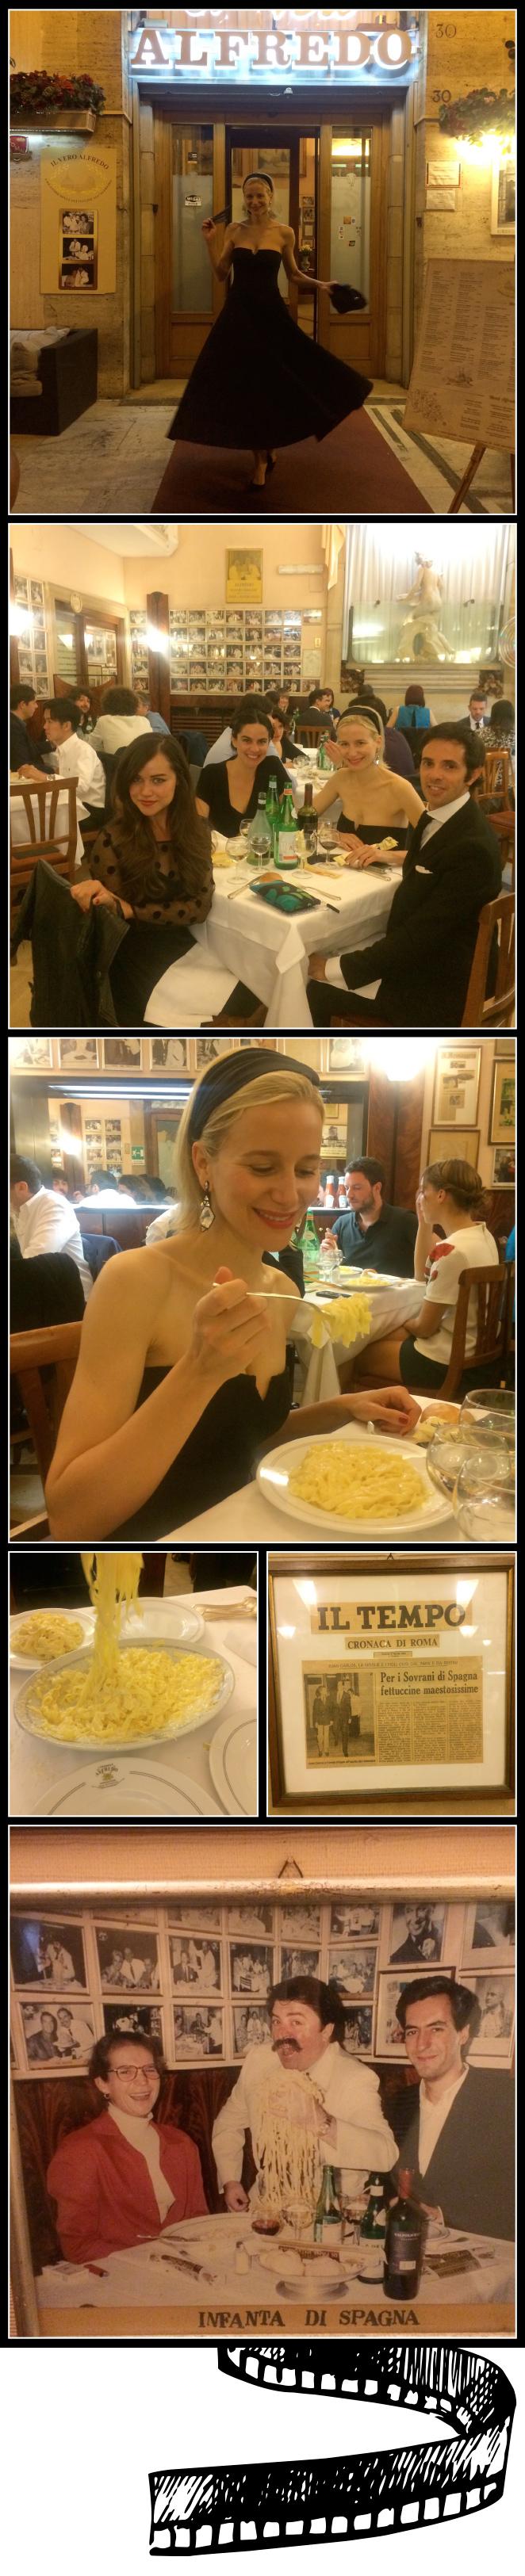 Restaurante Alfredo, Roma